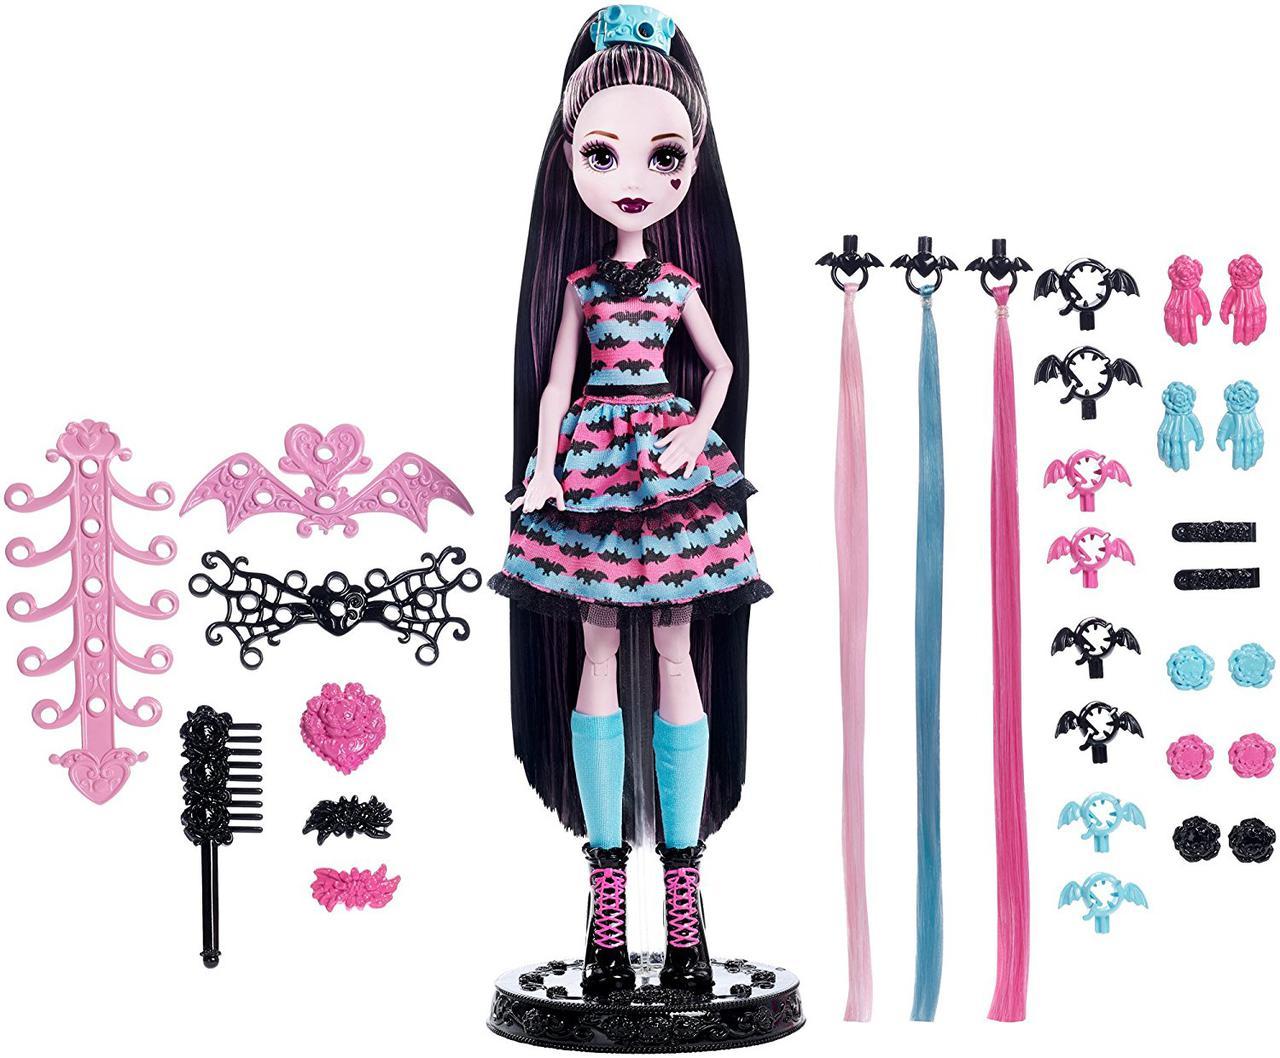 Дракулаура Вечеринка причесок Кукла Монстер Хай Monster High Girls Party Hair Draculaura Doll